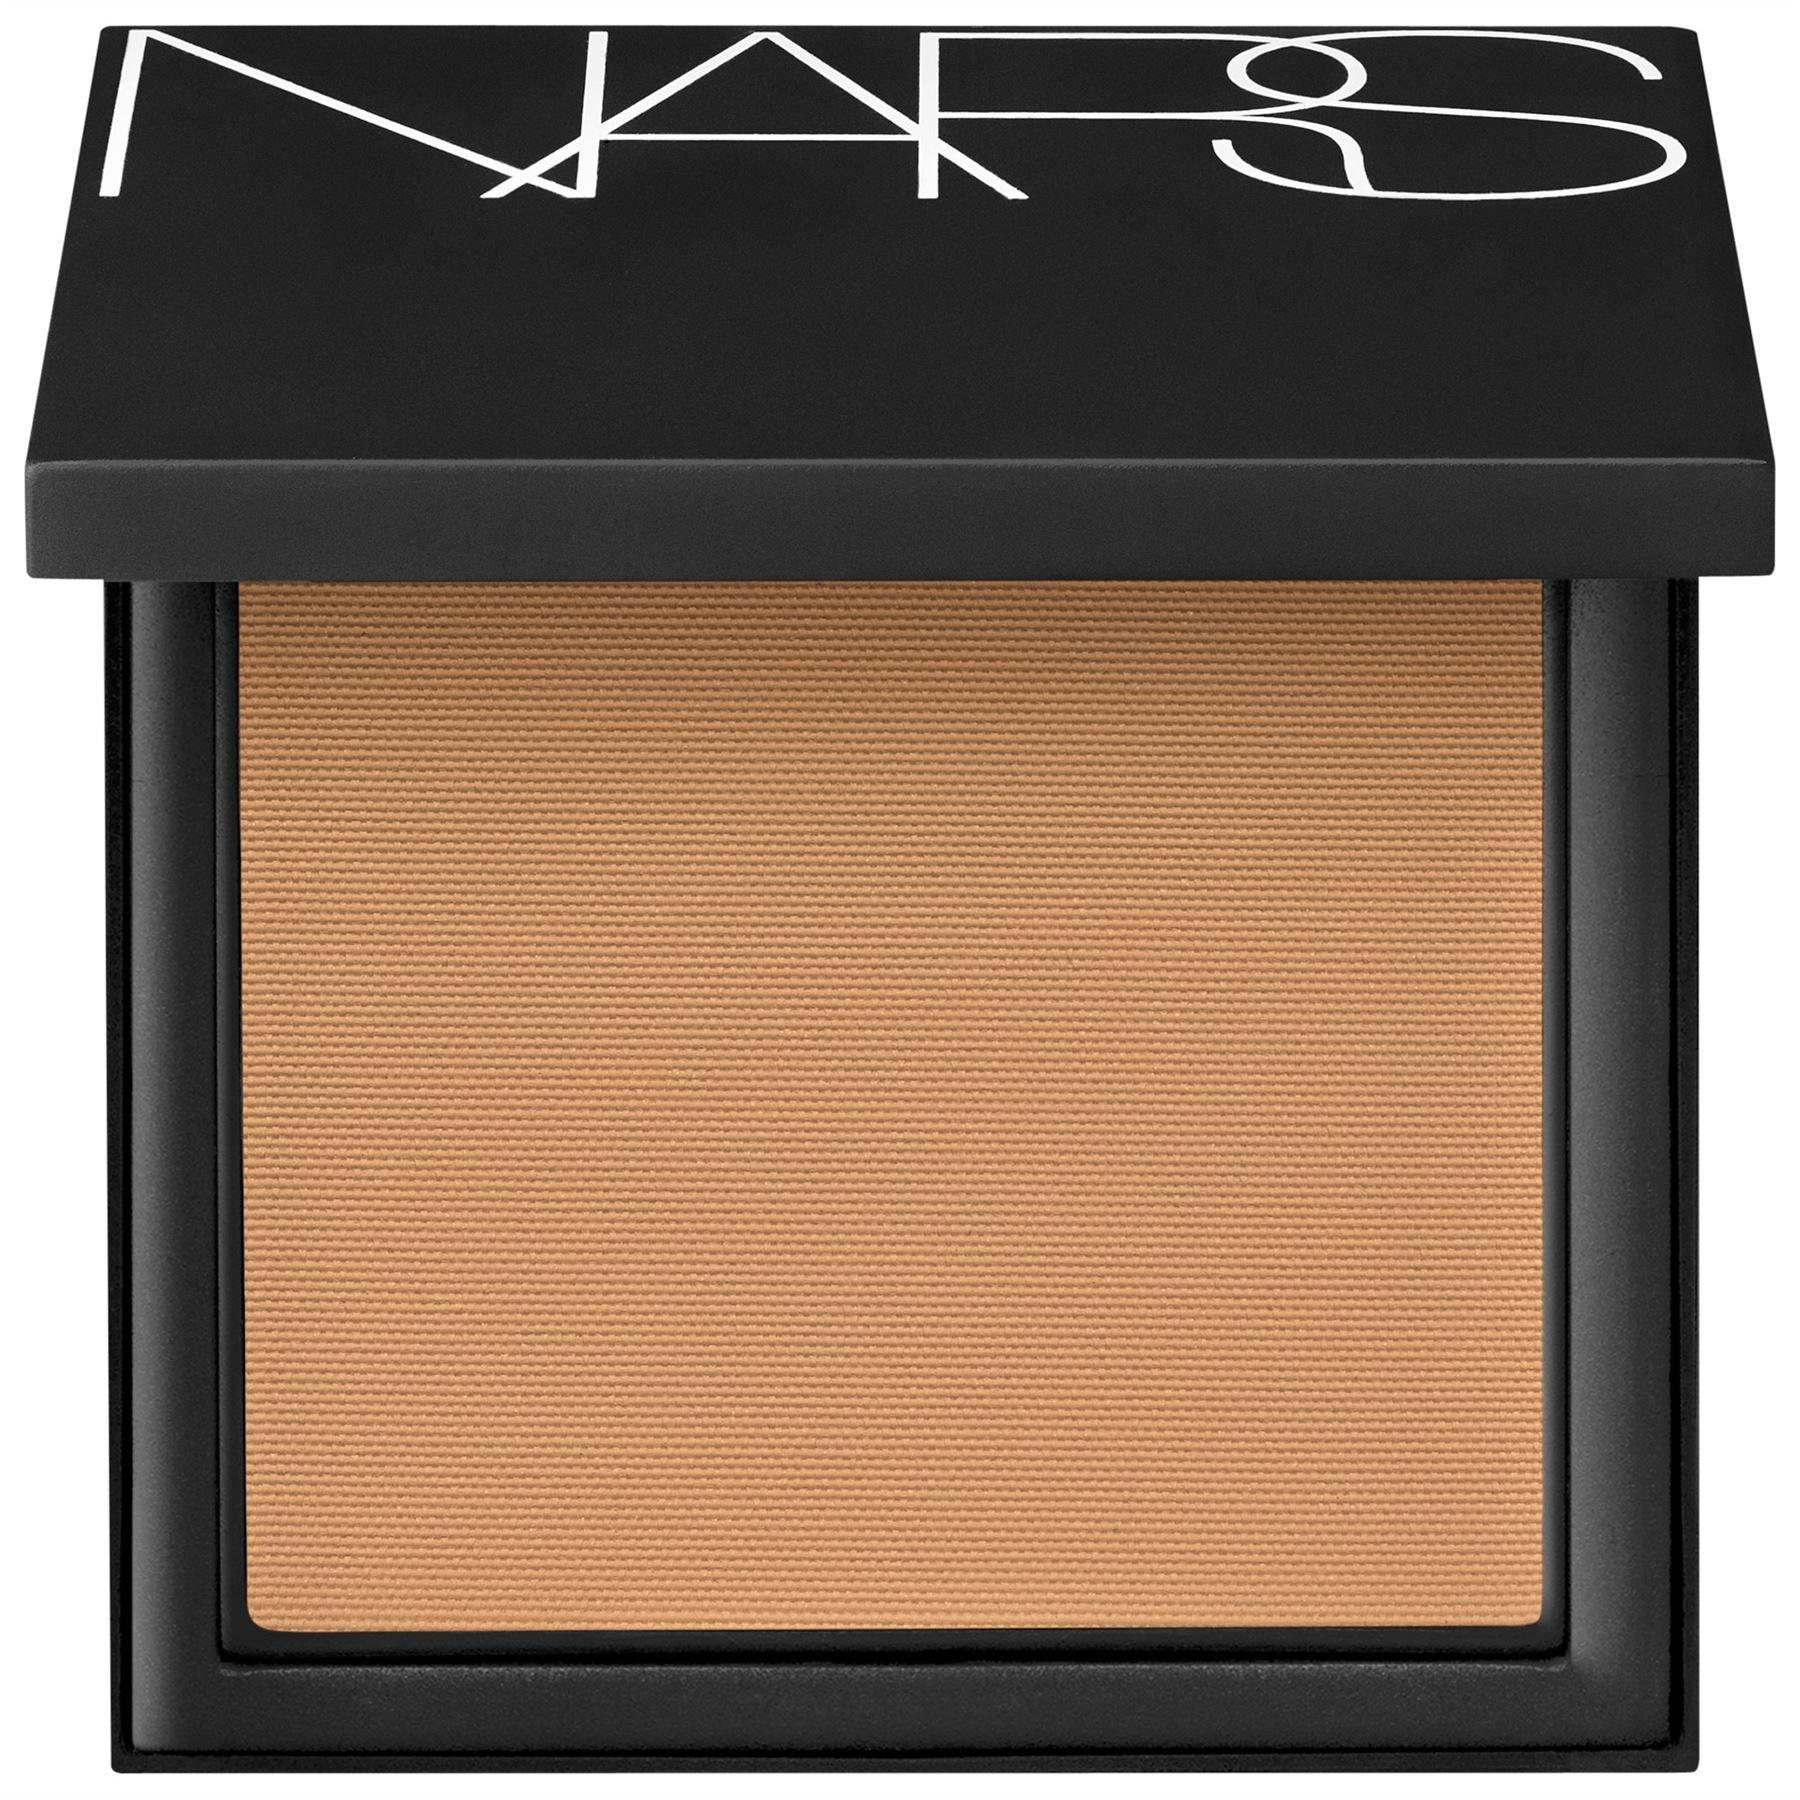 NARS Luminous Powder Foundation Tahoe - Pack of 6